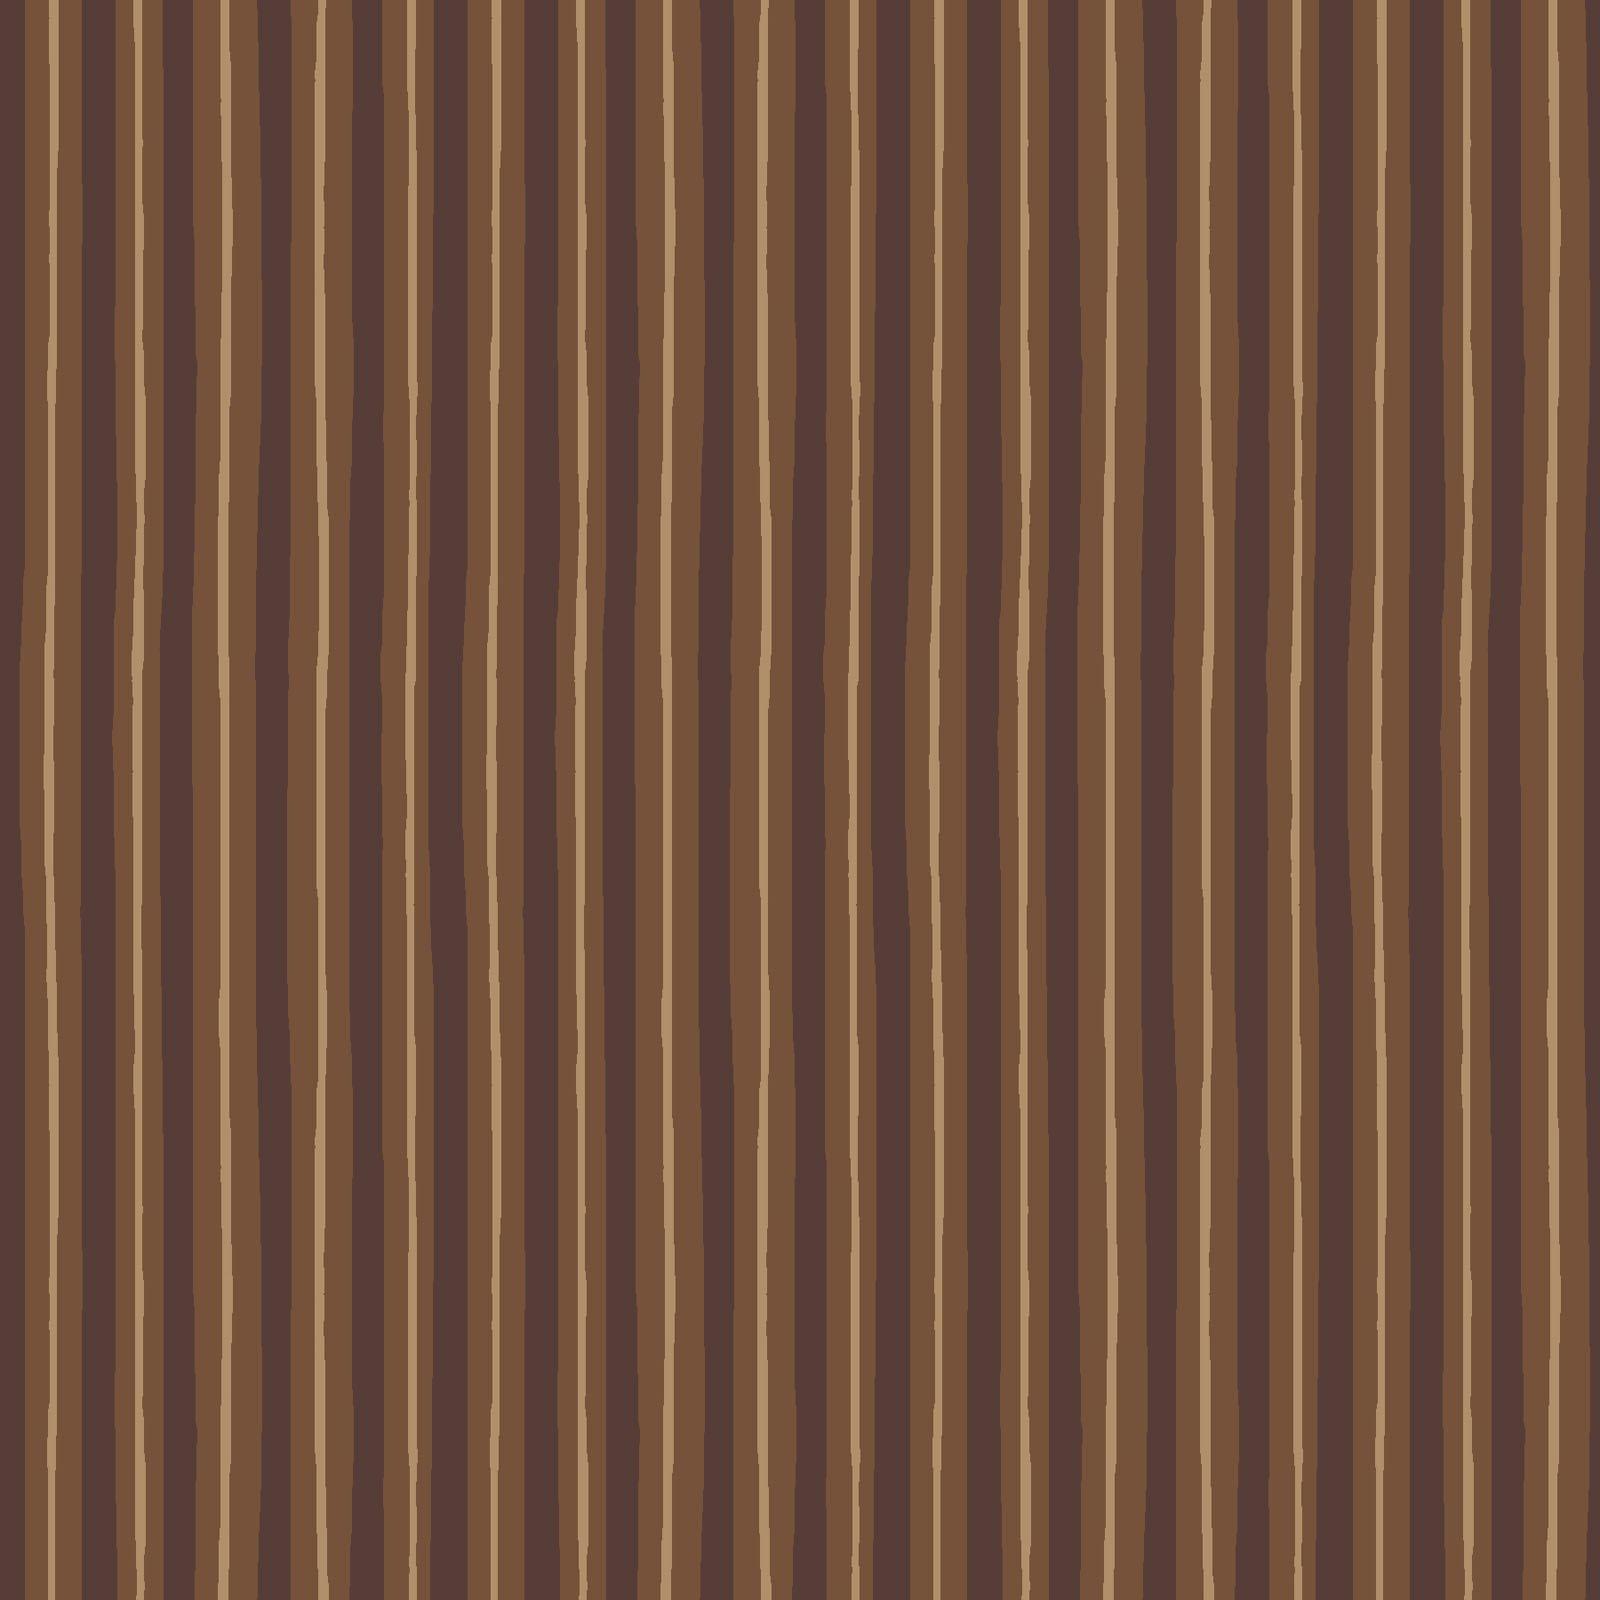 KimberBell Basics Brown Little Stripe 8242M-AA